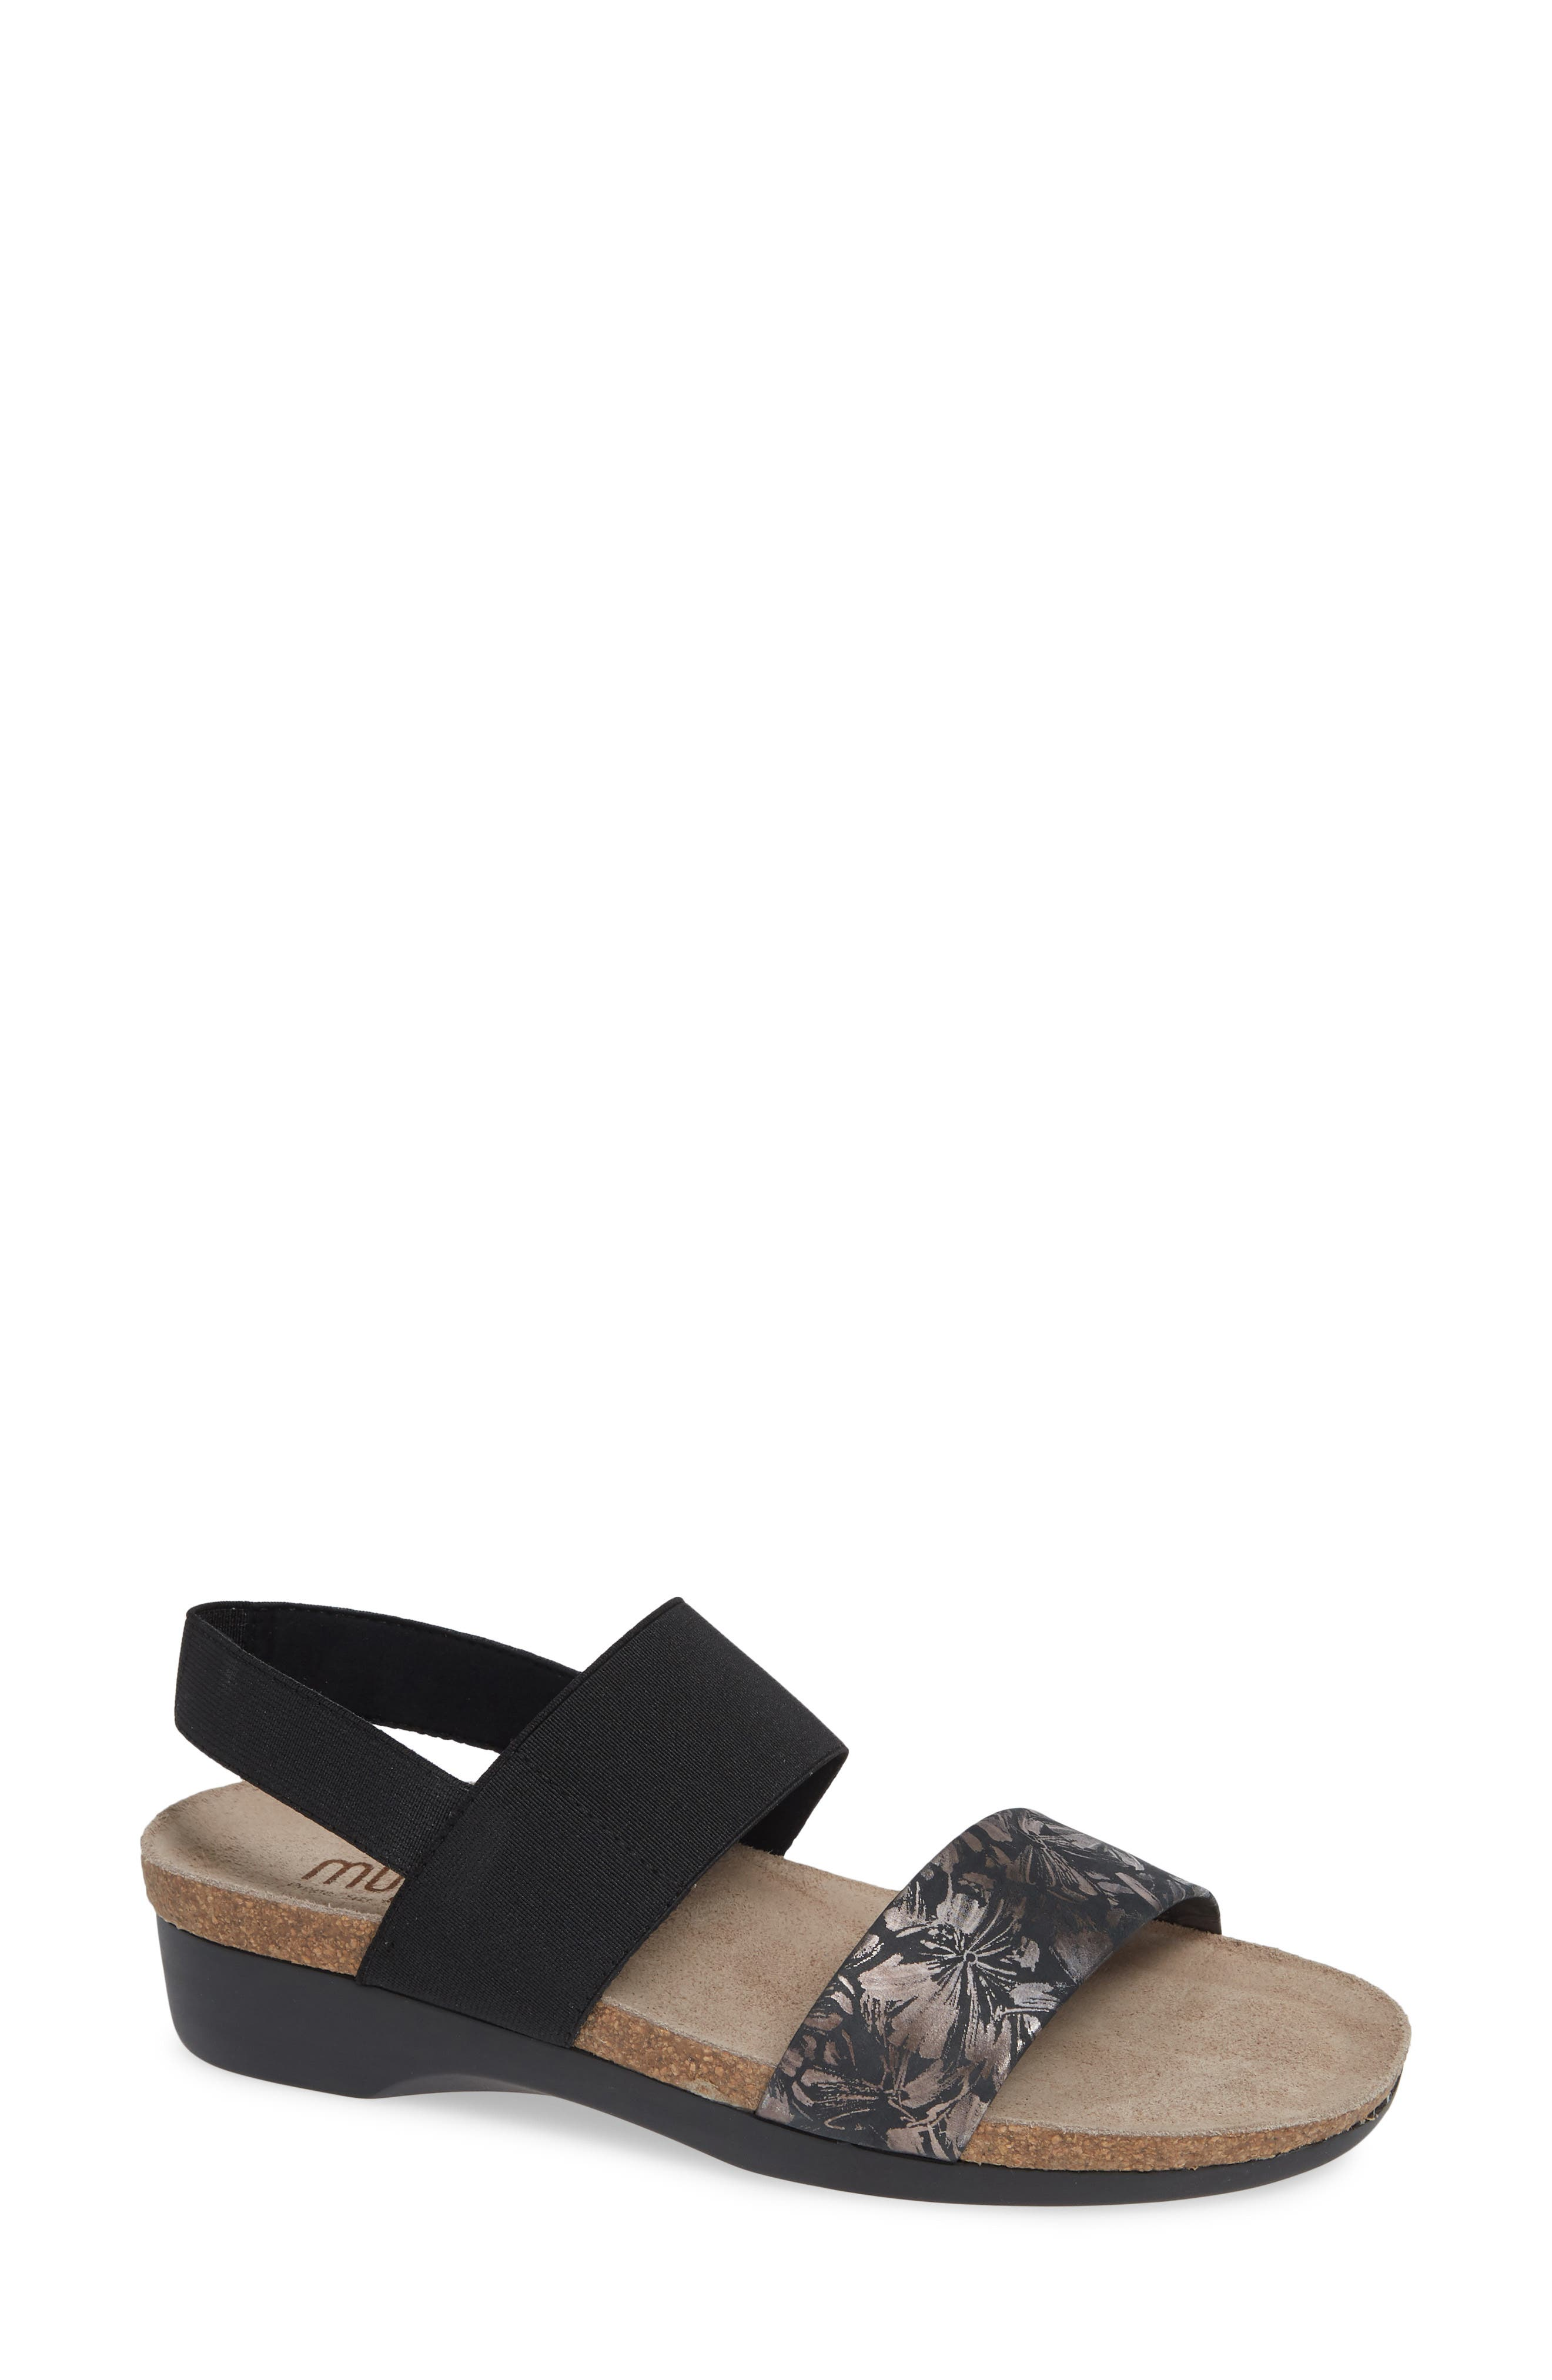 'Pisces' Sandal, Main, color, DARK FLORAL PRINT LEATHER